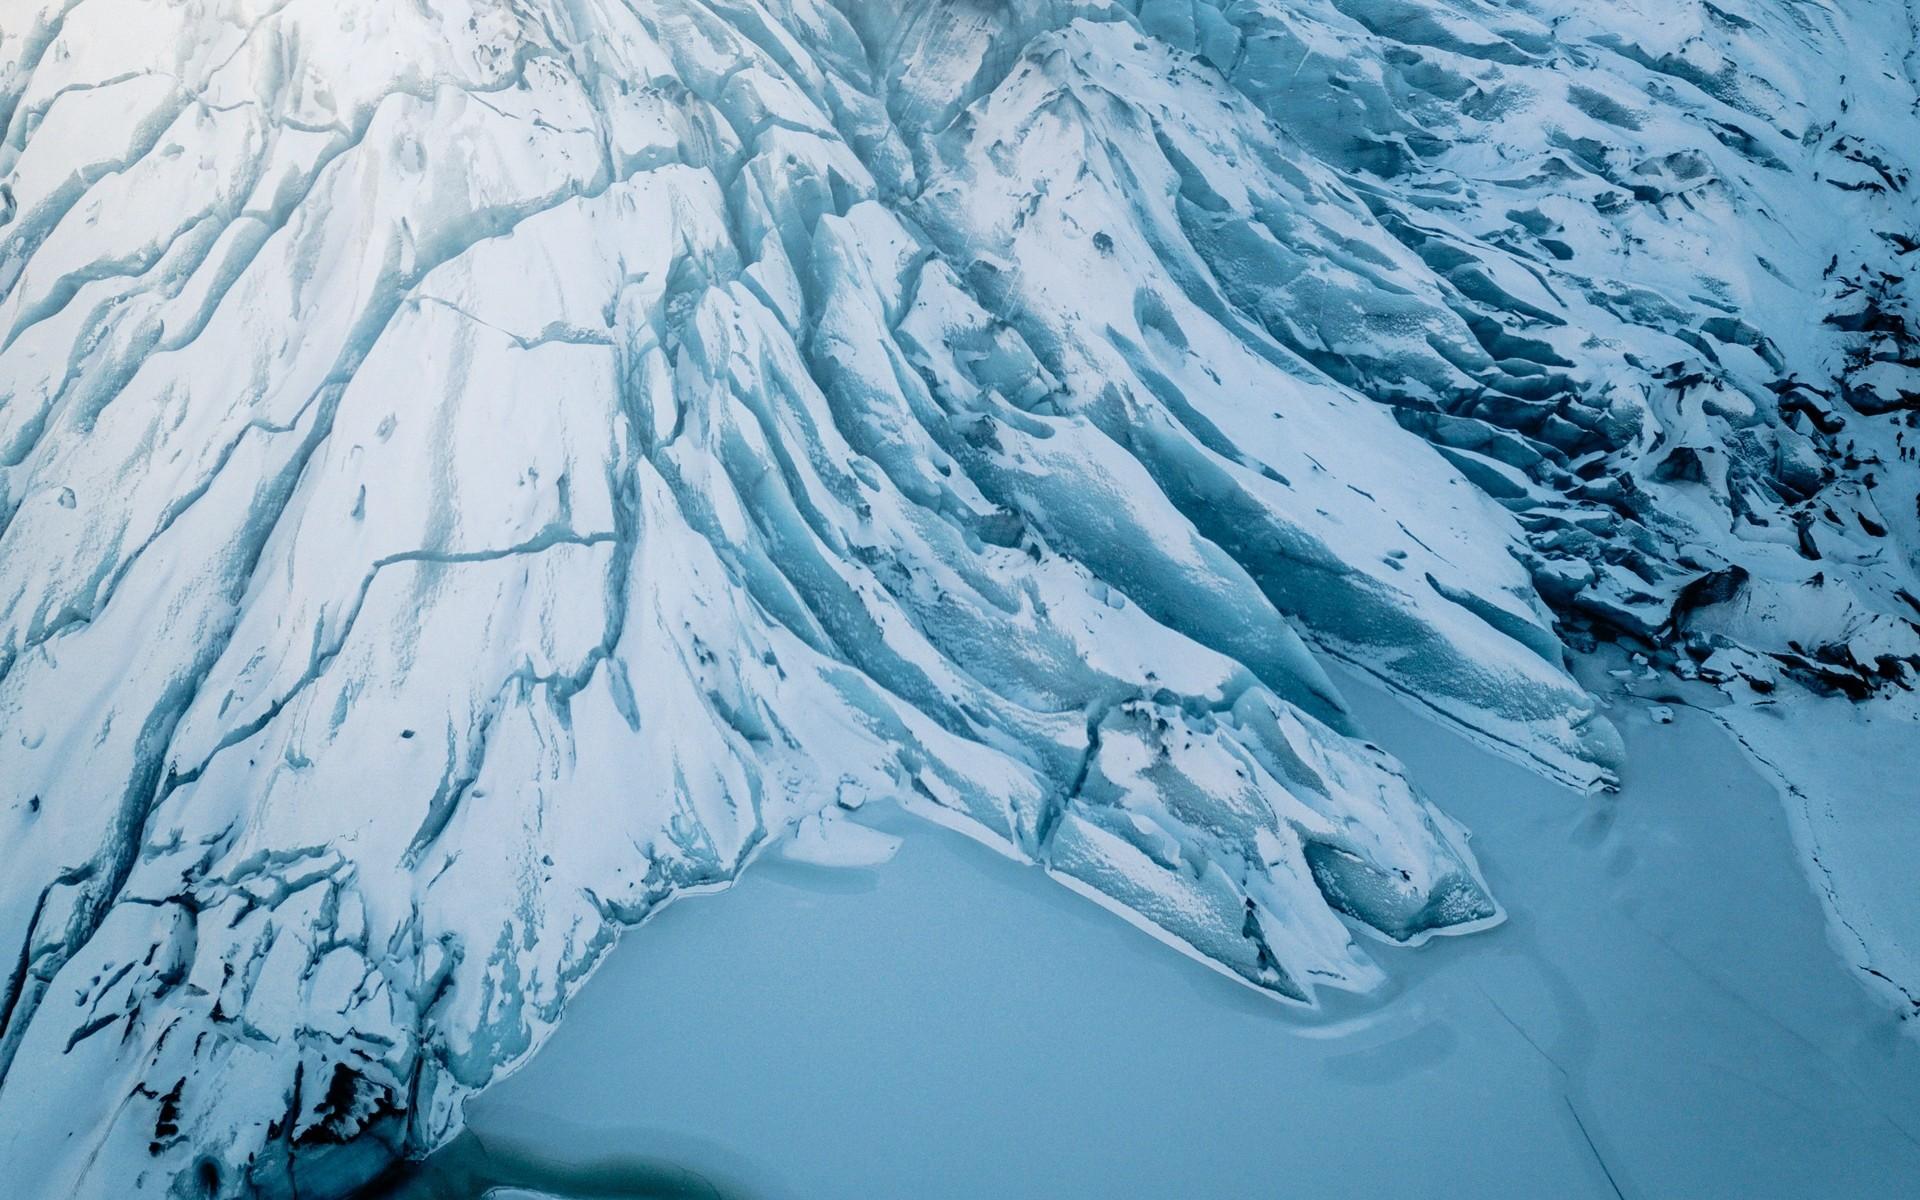 Res: 1920x1200, Mountain glacier wallpaper HD